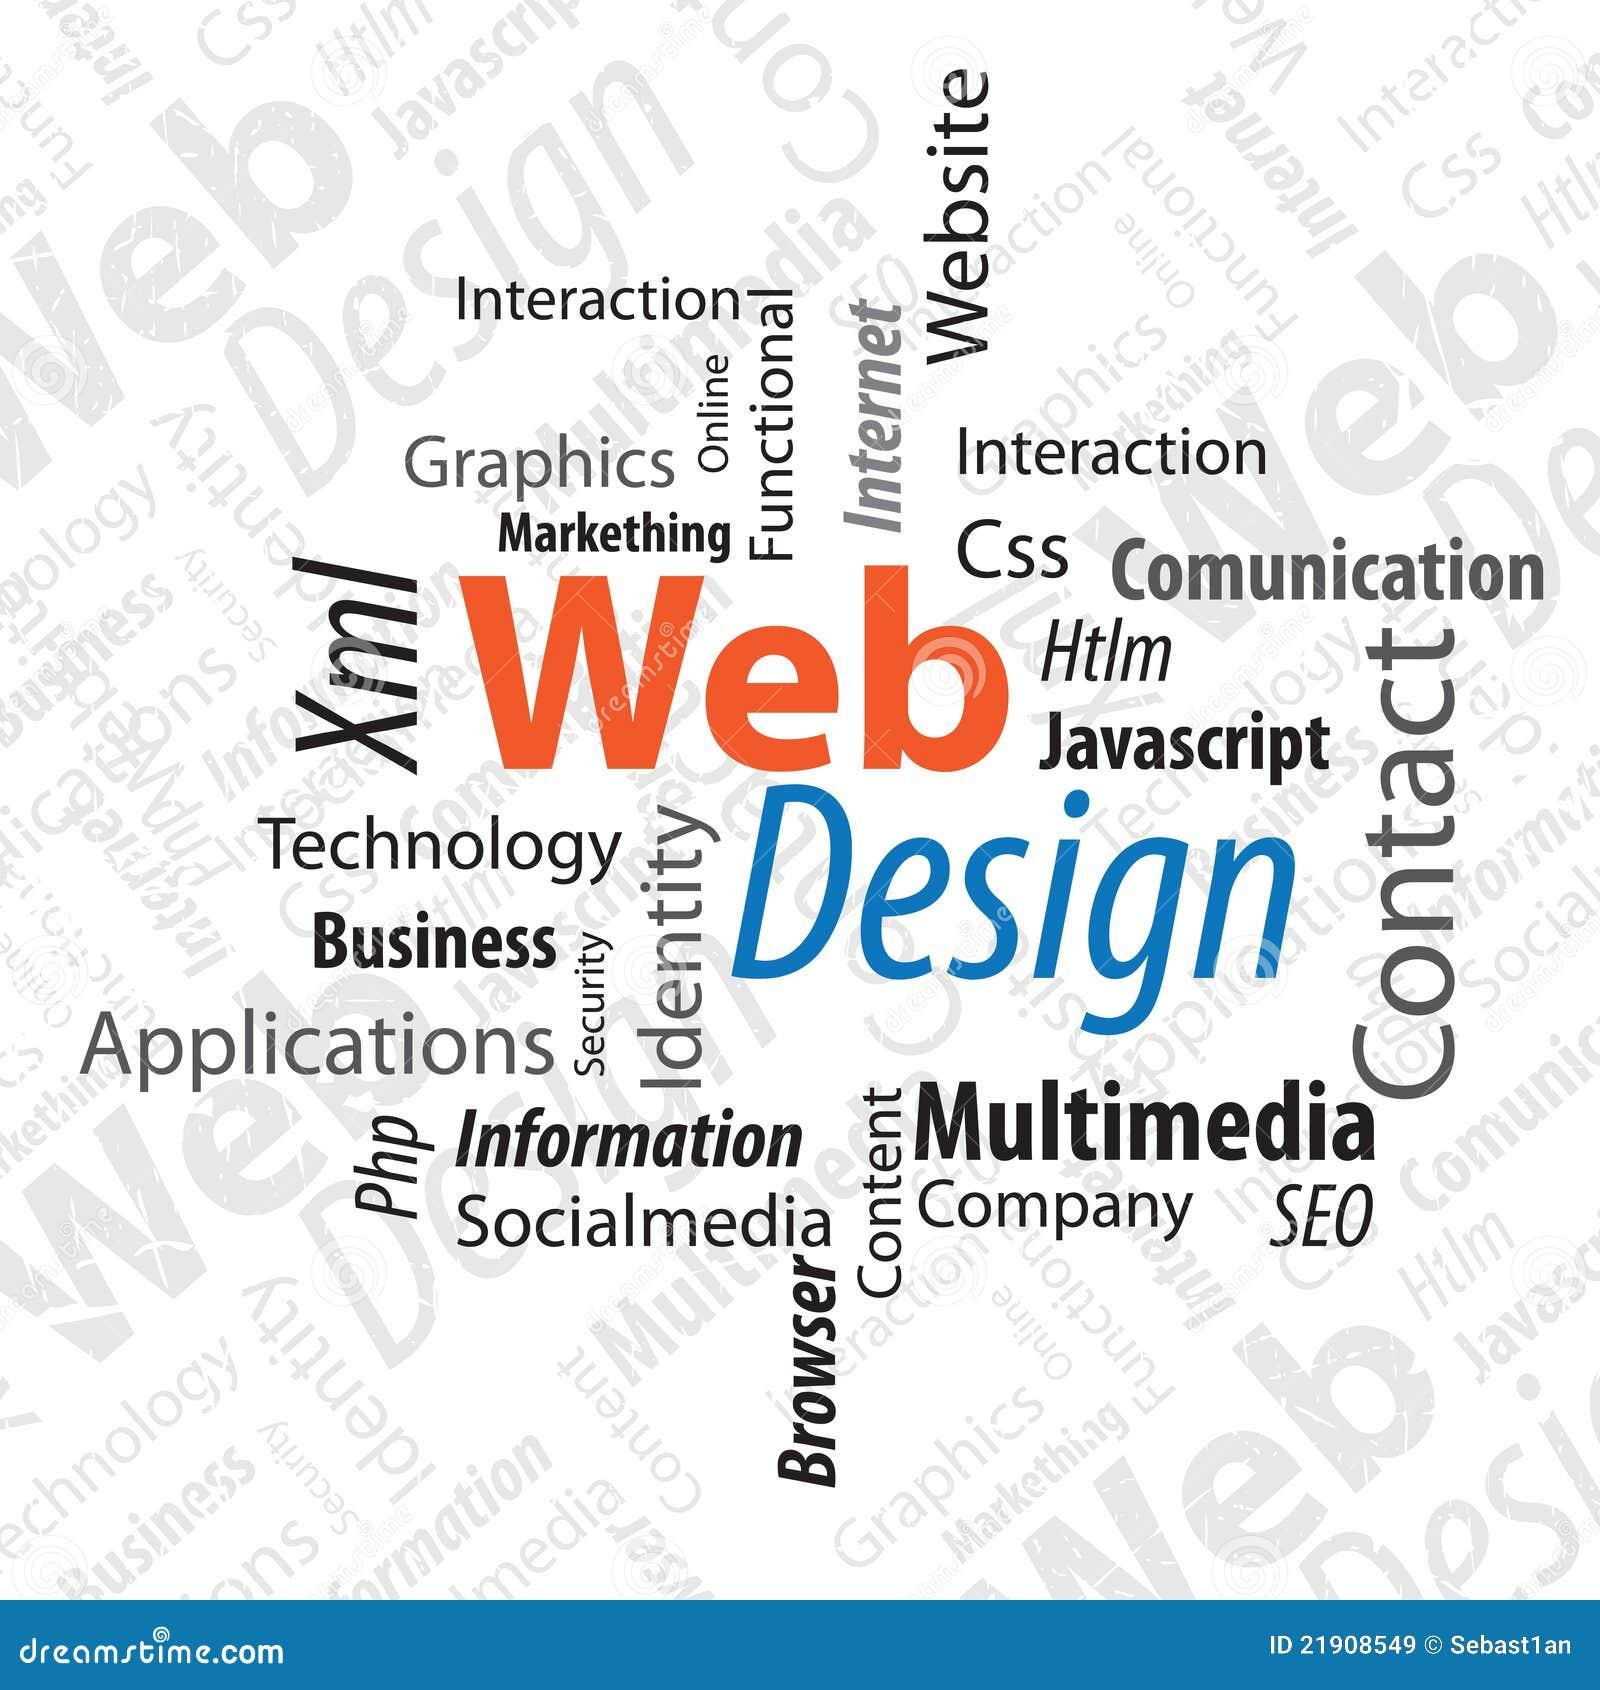 Vector Illustration Web Designs: Typography Web Design Stock Vector. Illustration Of